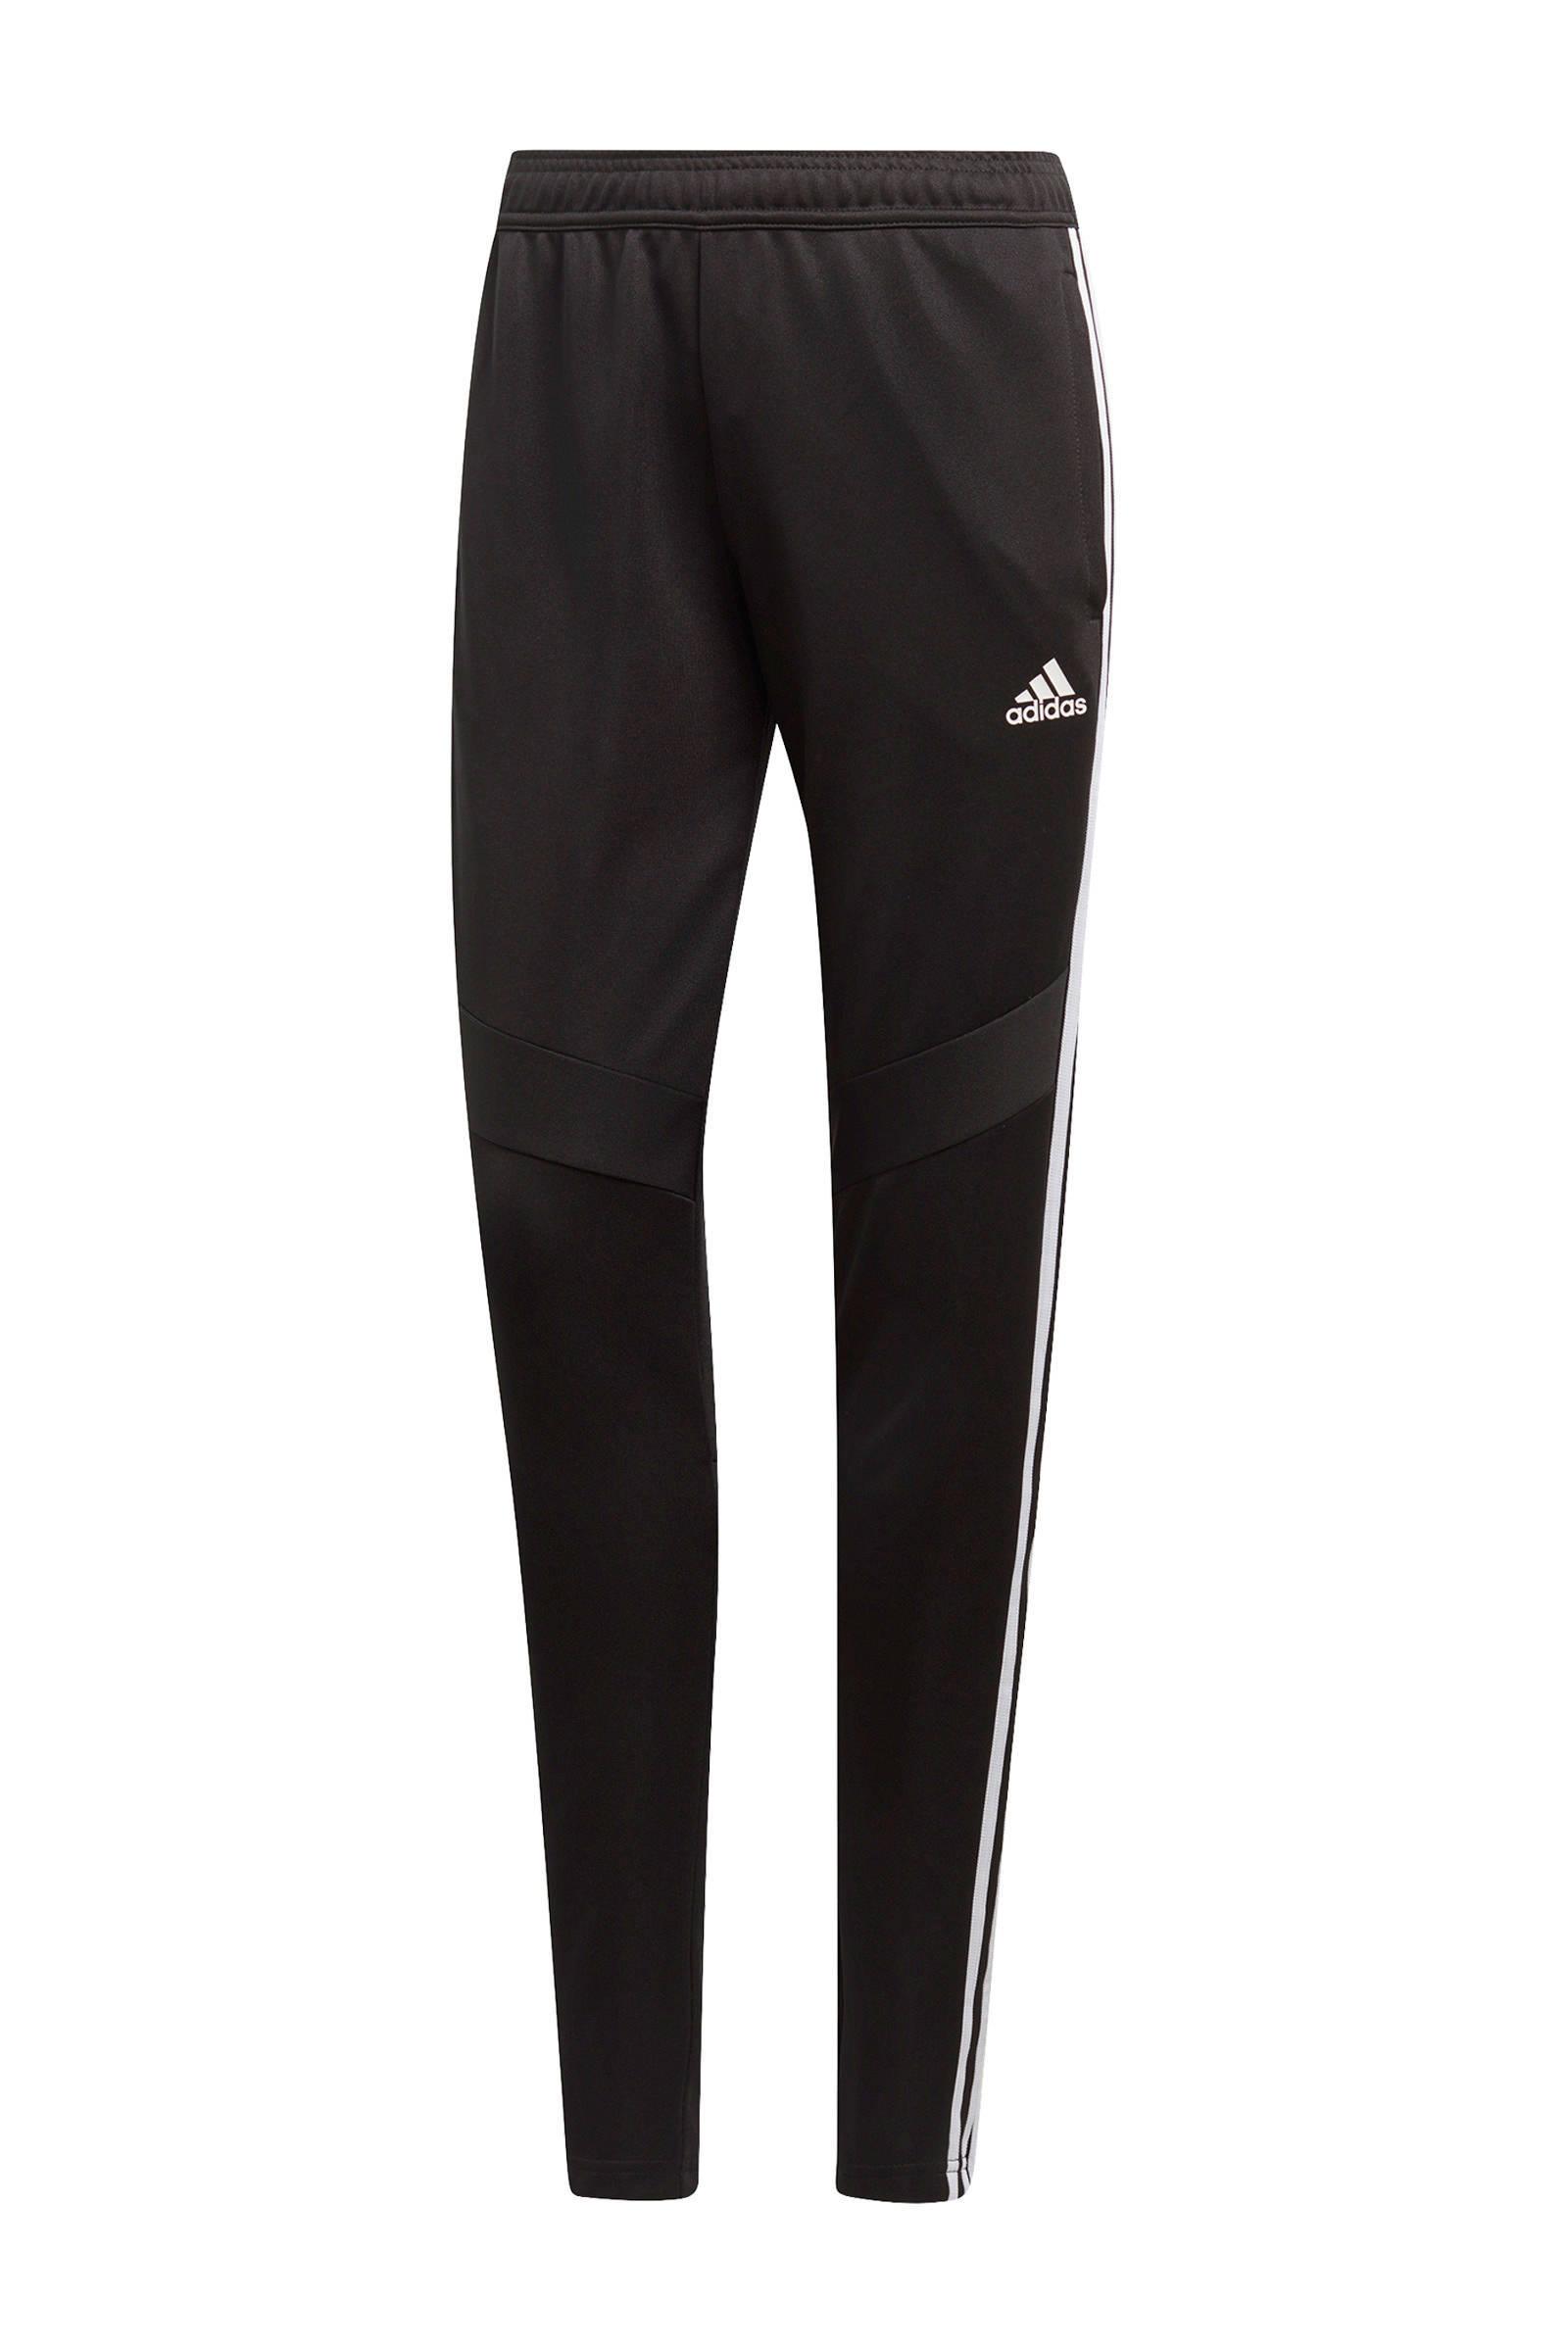 844505365 adidas-performance-voetbalbroek-zwart-dames-zwart-4060515434024.jpg